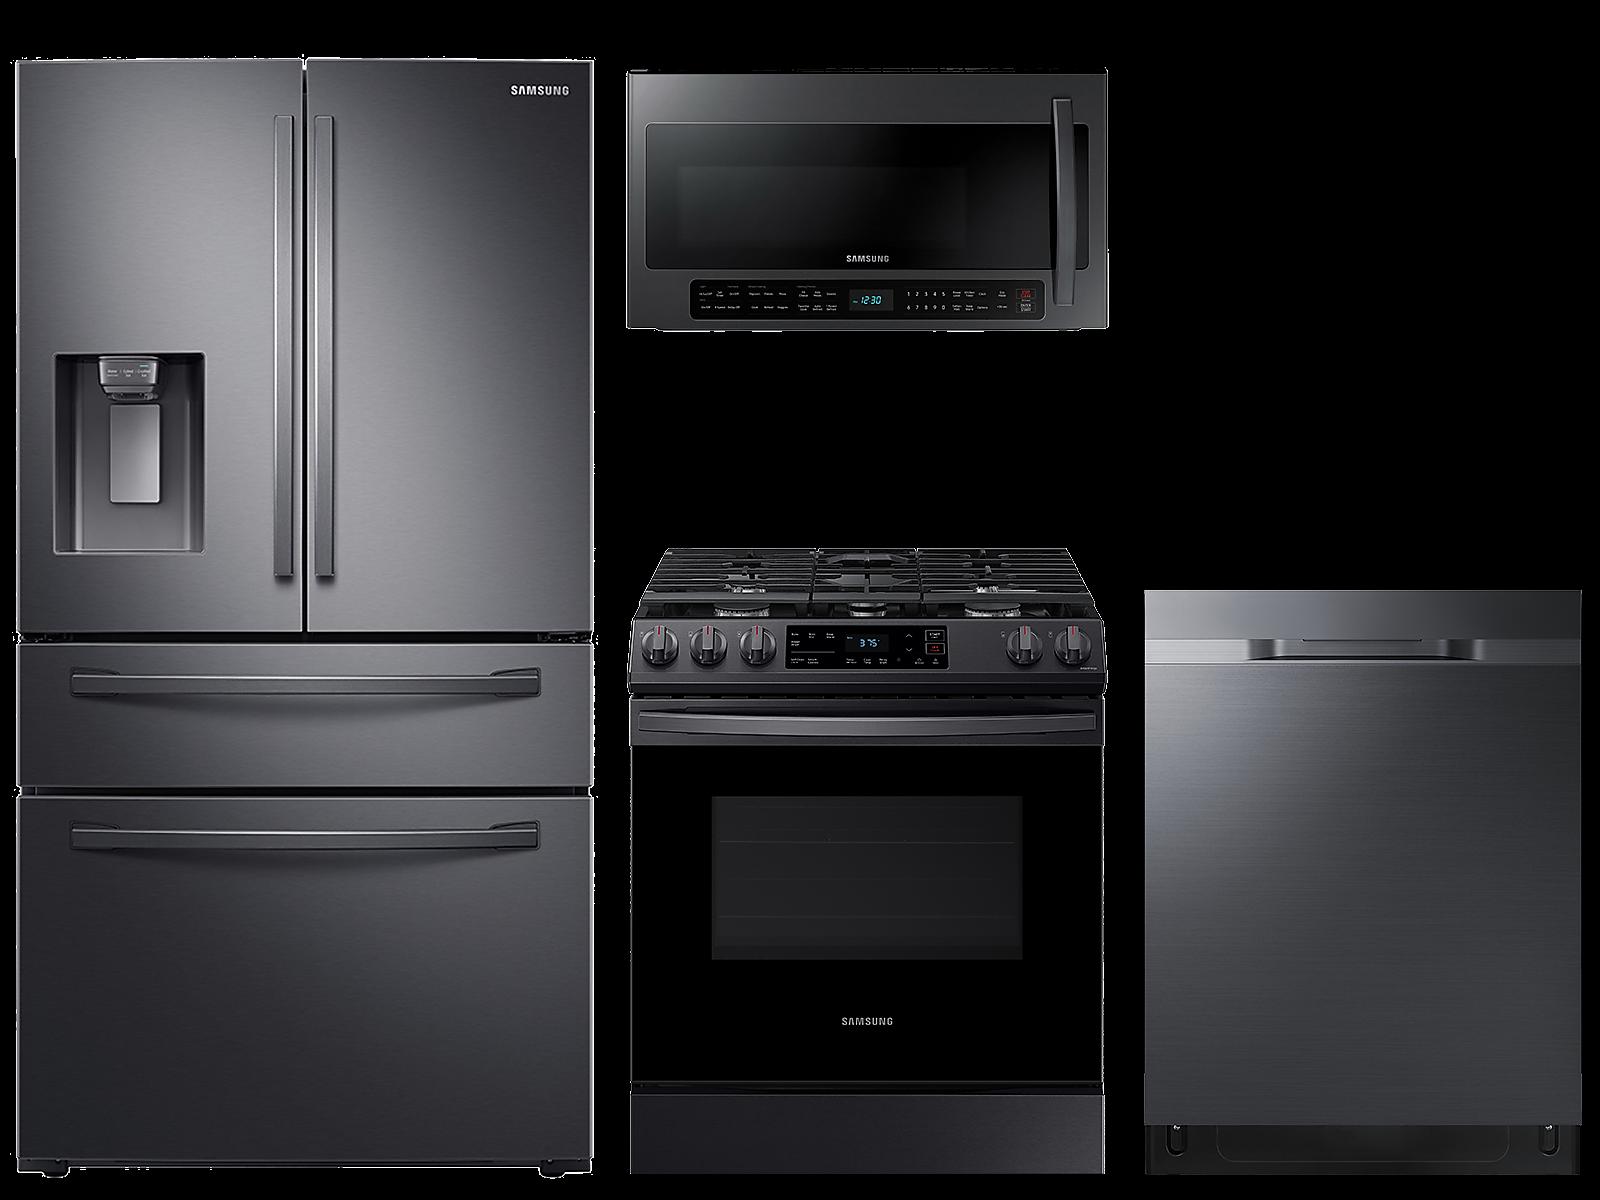 Samsung coupon: Samsung 28 cu. ft. 4-door refrigerator, gas range, 2.1 cu. ft. microwave and 48 dBA dishwasher package(BNDL-1614027154930)